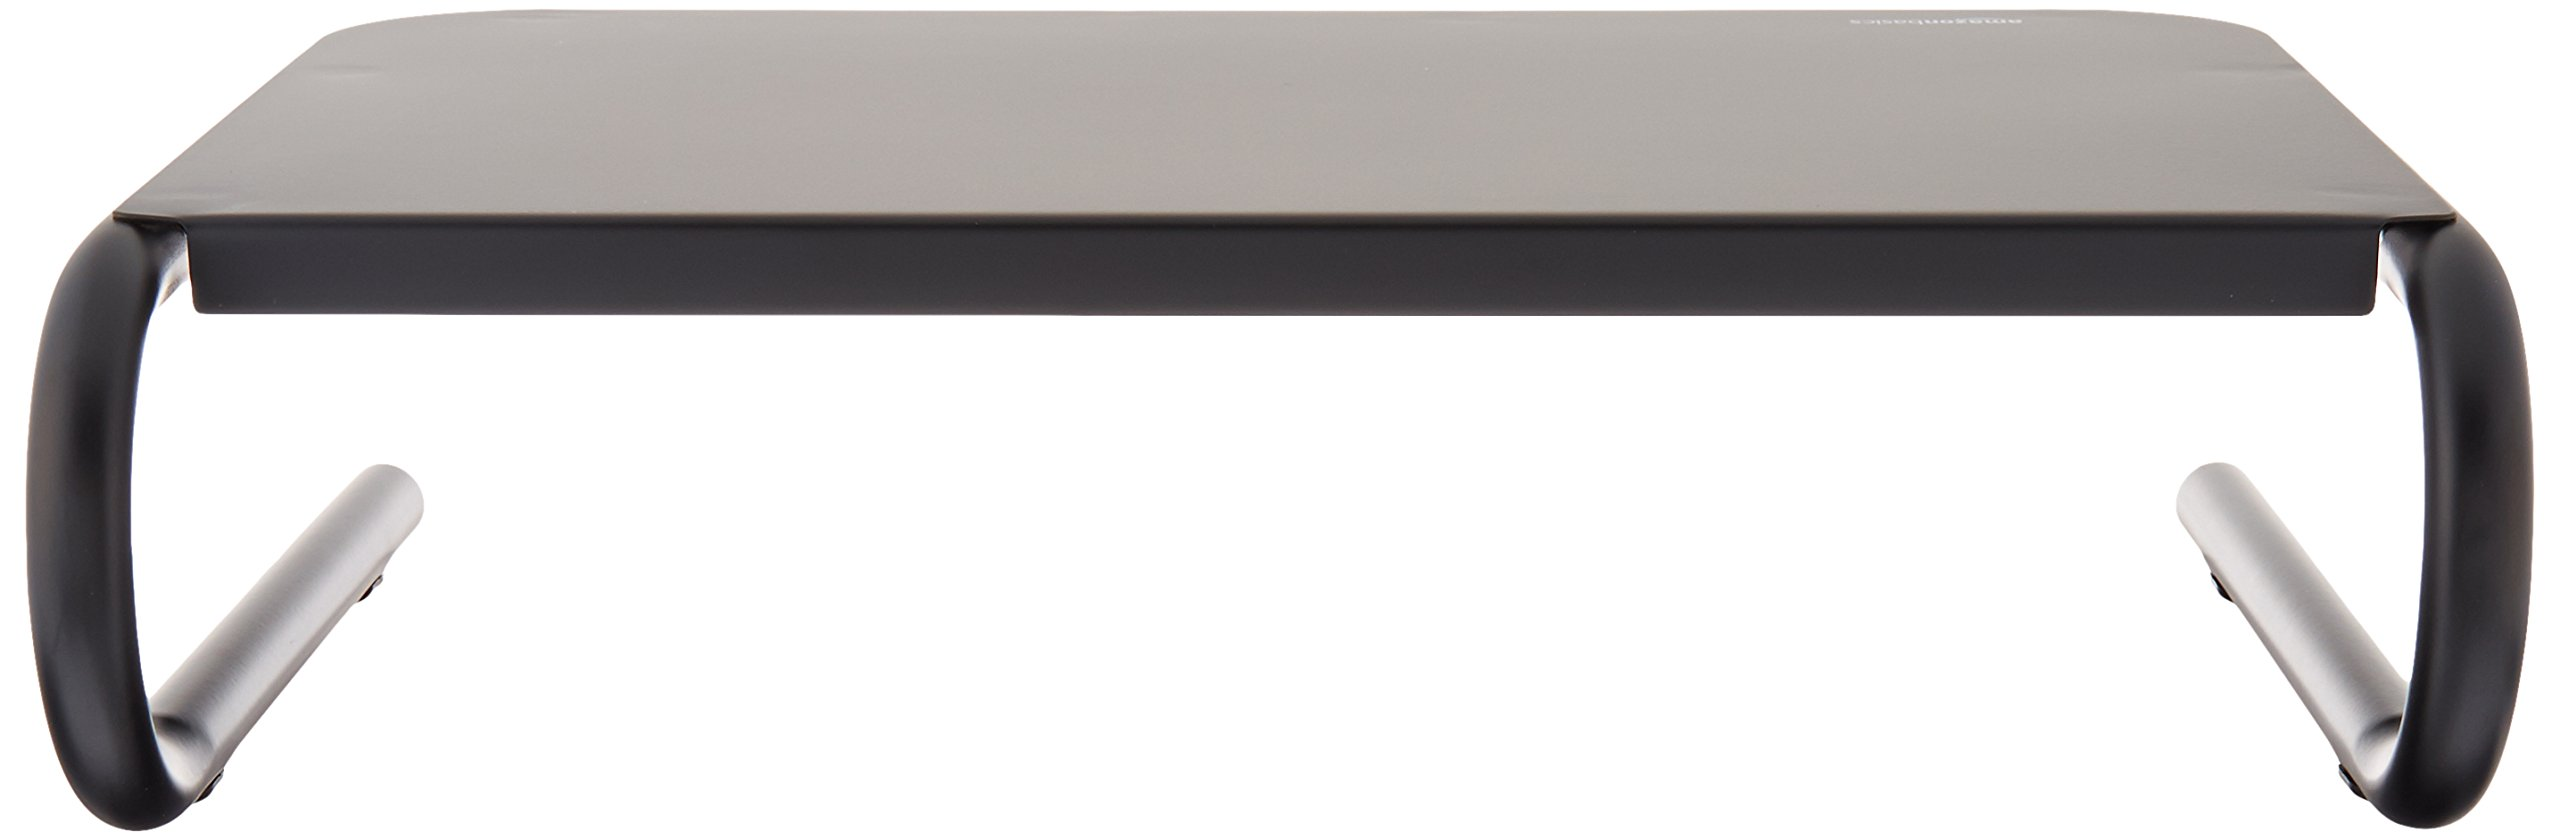 AmazonBasics Metal Monitor Stand - Black by AmazonBasics (Image #7)